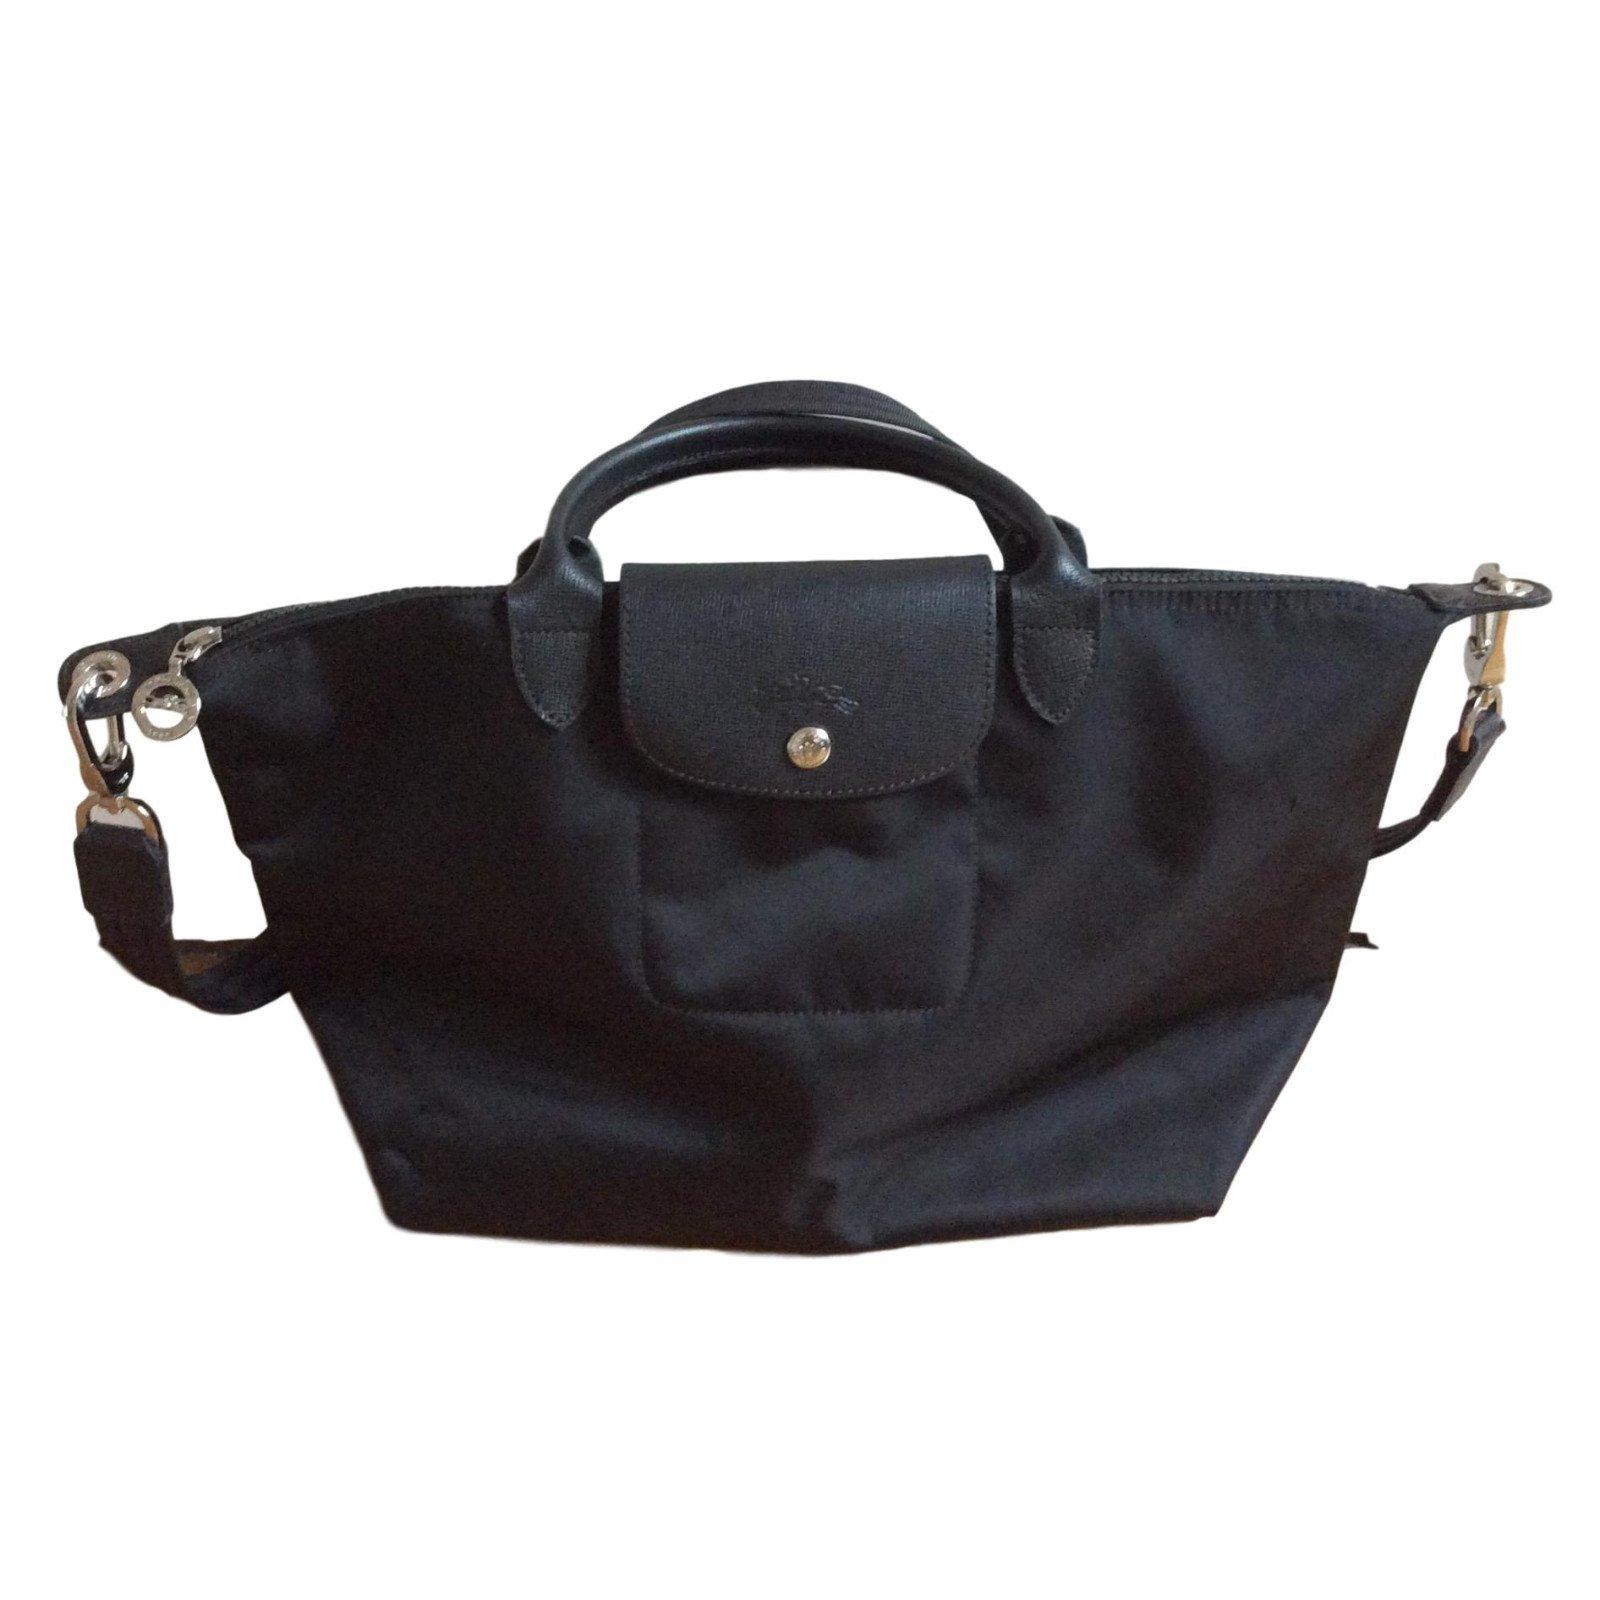 506c91b0a30 Longchamp le pliage néo taillé M Handbags Nylon Black ref.57740 ...